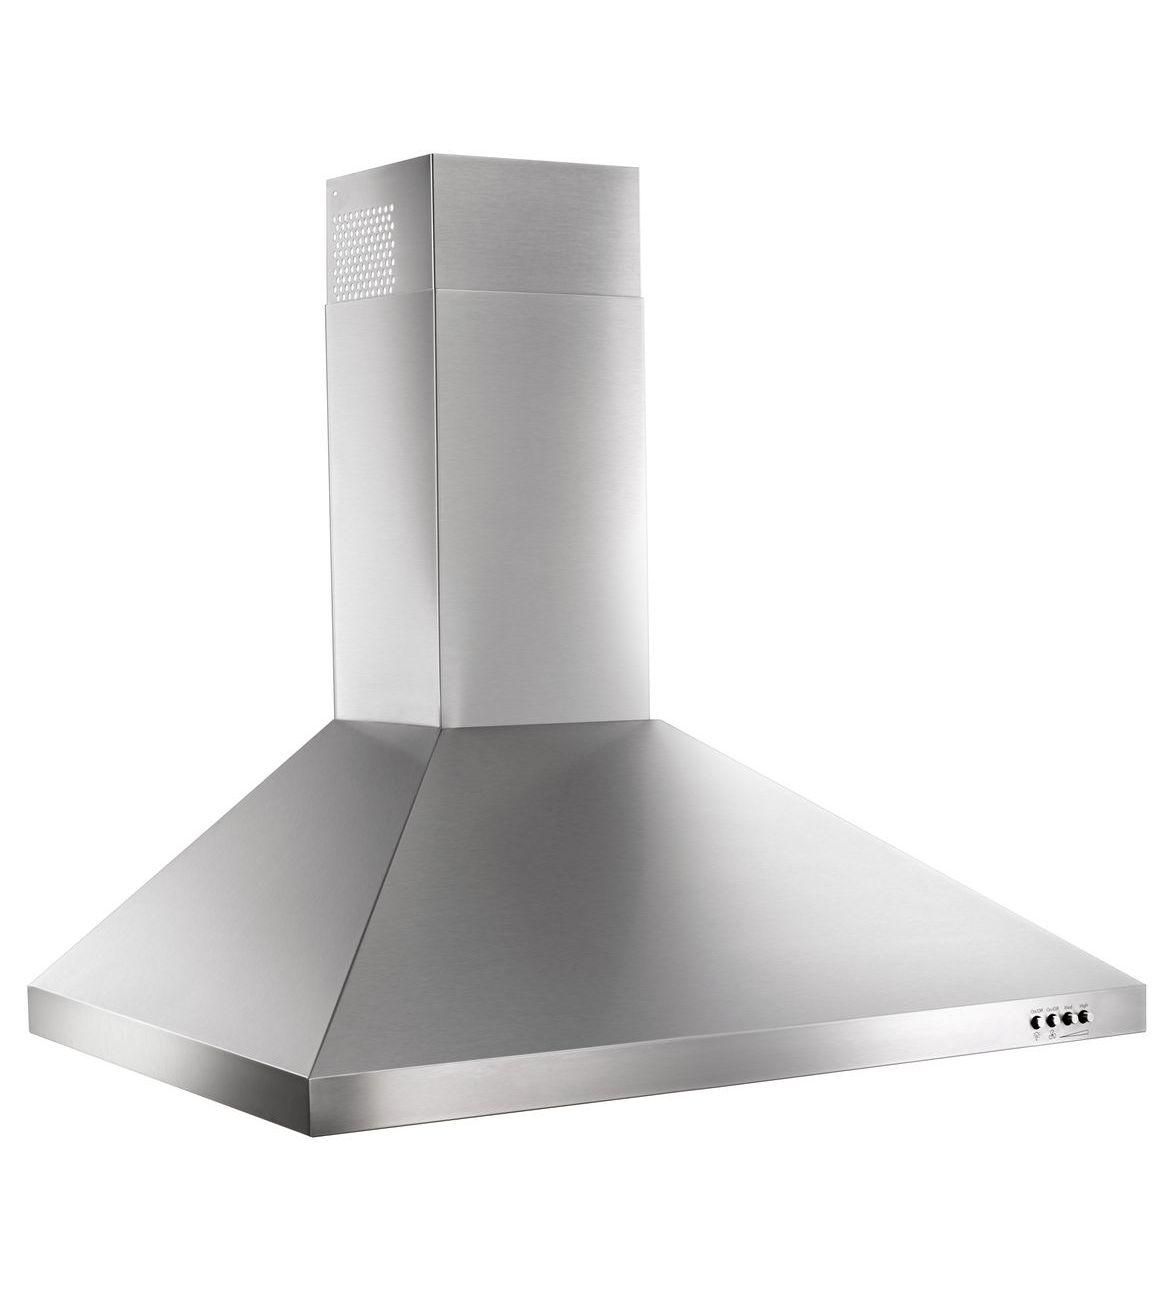 kitchen hood classic sink wvw57uc0fs 30 stainless steel wall mount flat range wvw57uc0fsgallery image